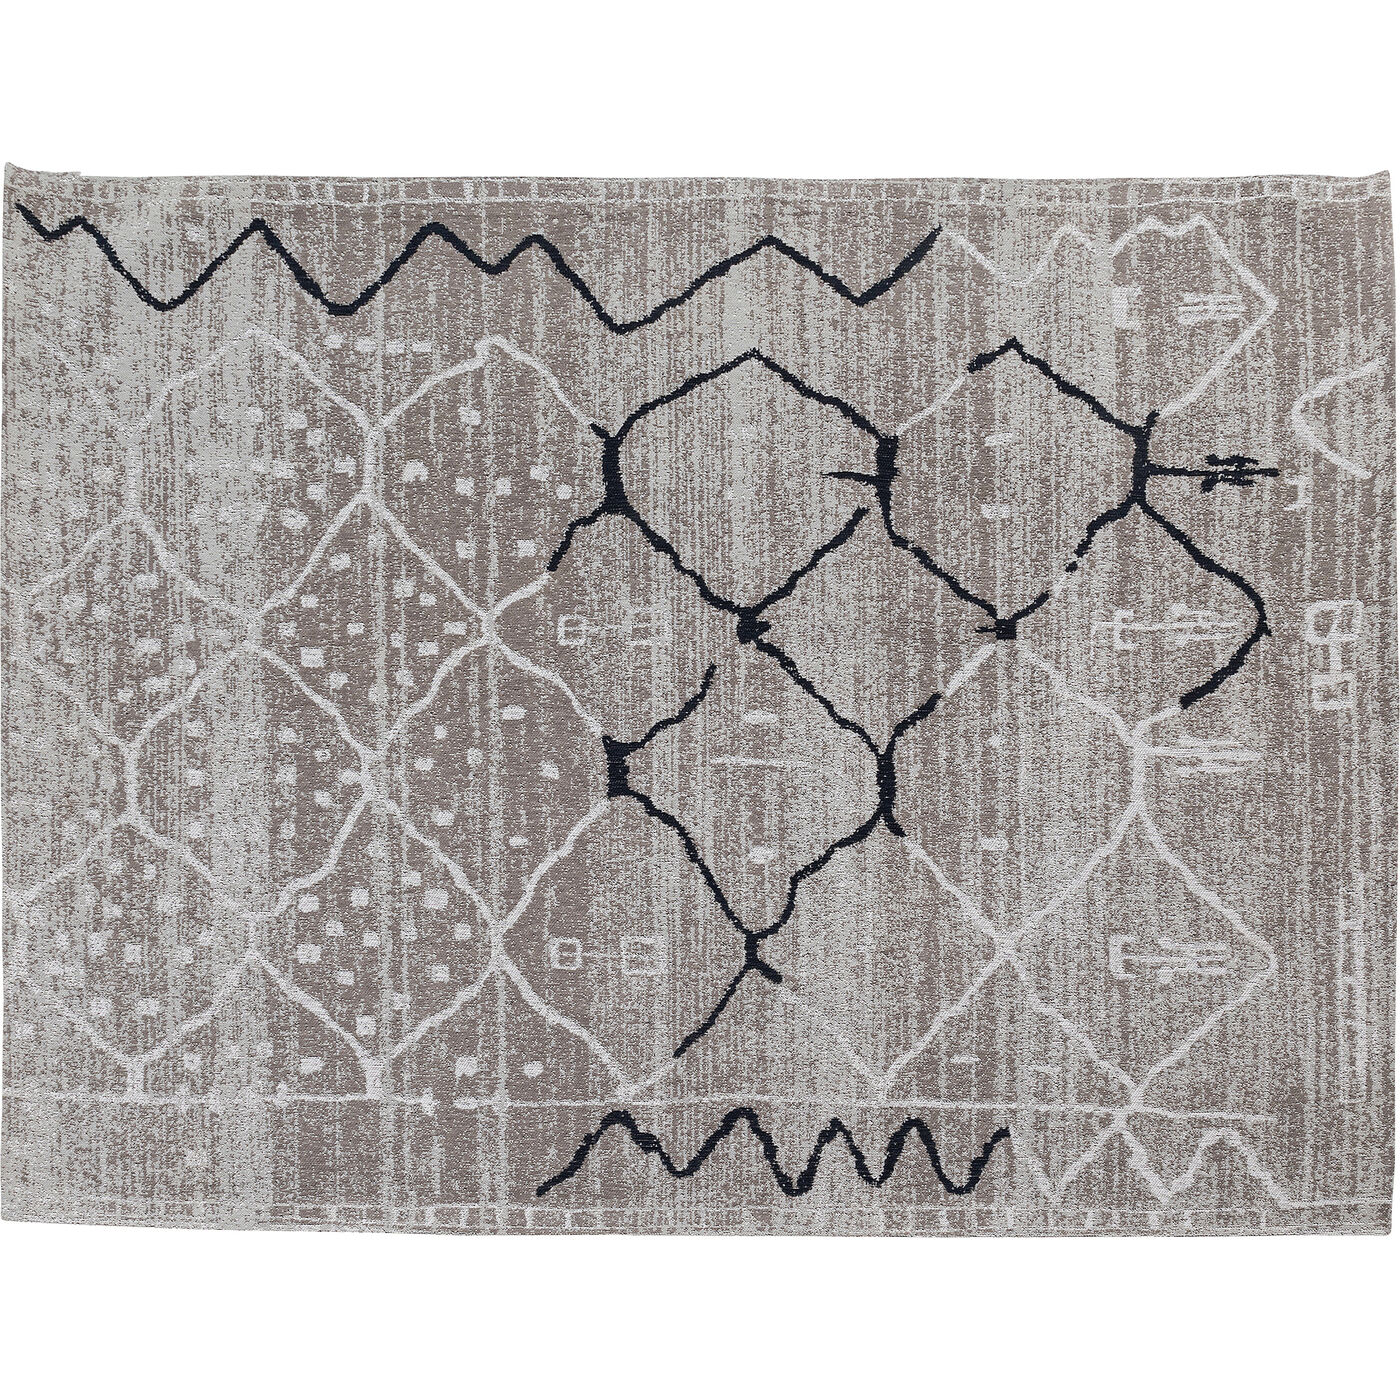 Teppich El Jadida 240x170